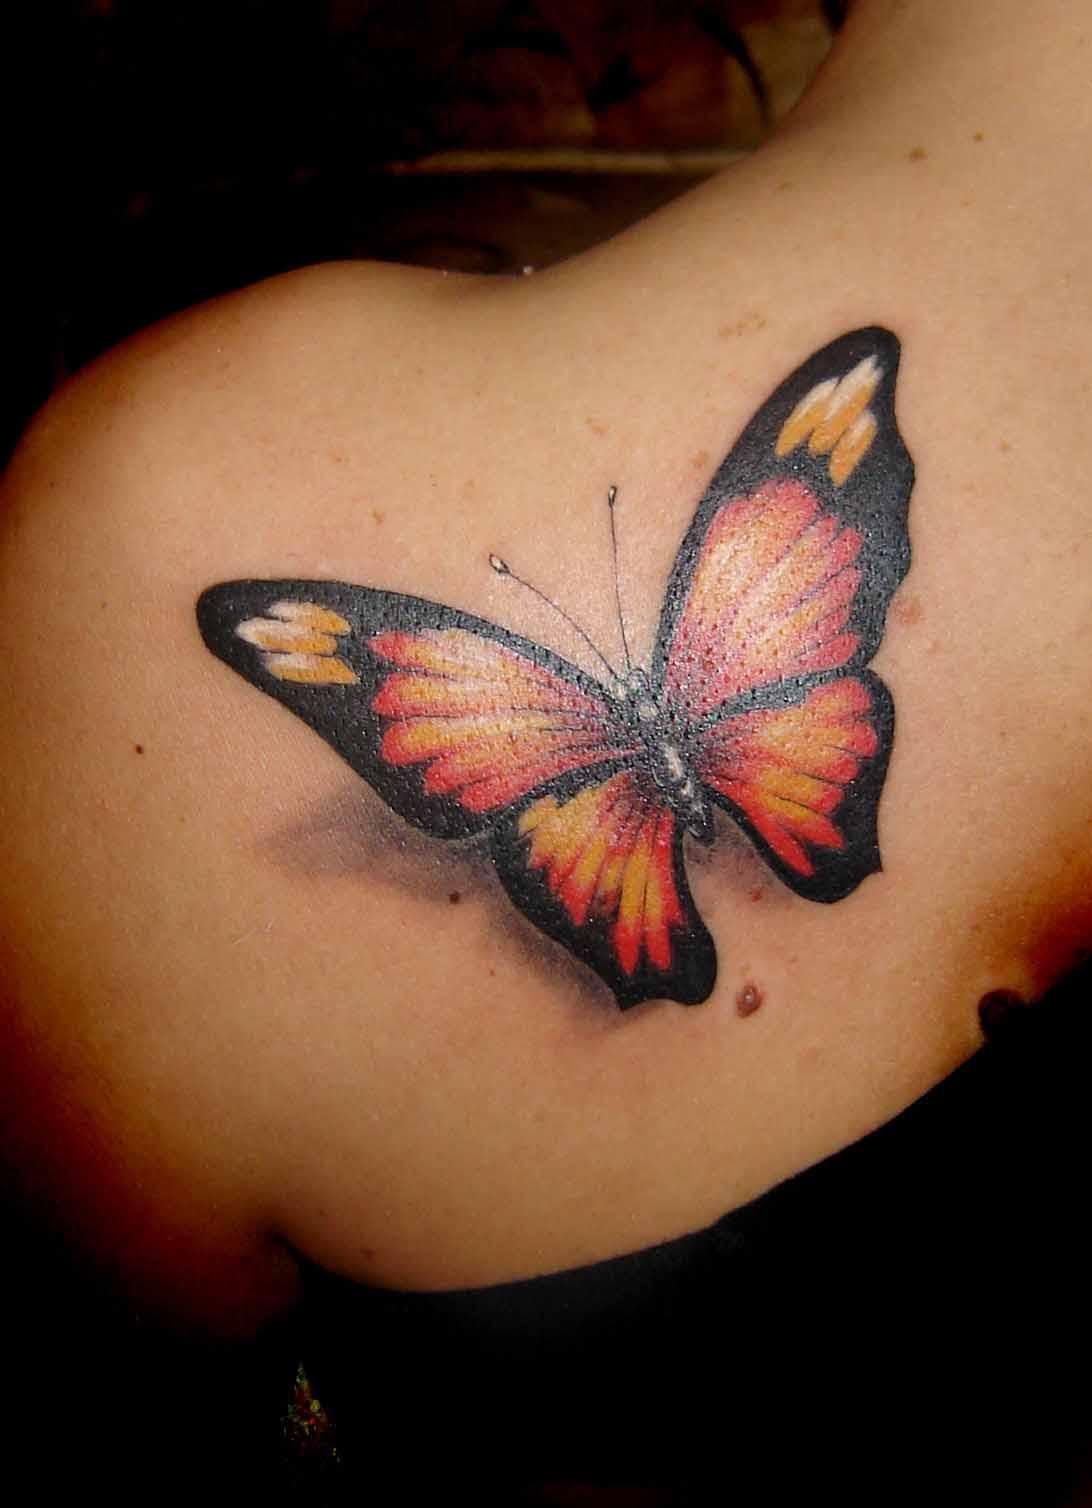 30+ Impressive Tattoo Designs For Women | Funlava.com